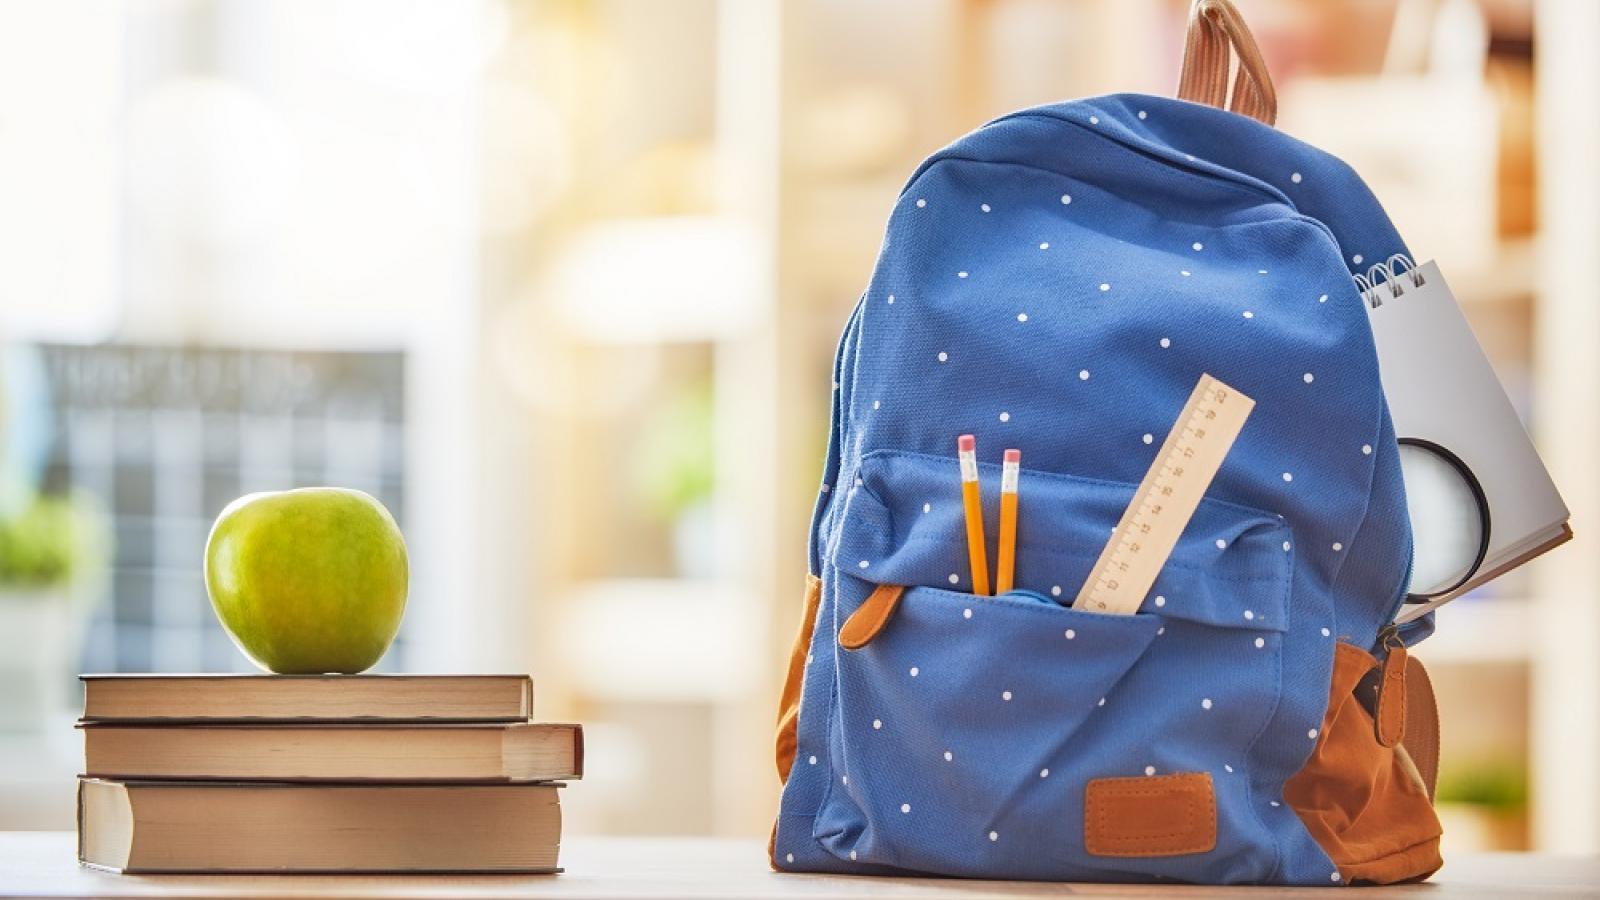 Online enrolment in parallel track, homeschooling kicks off on September 8